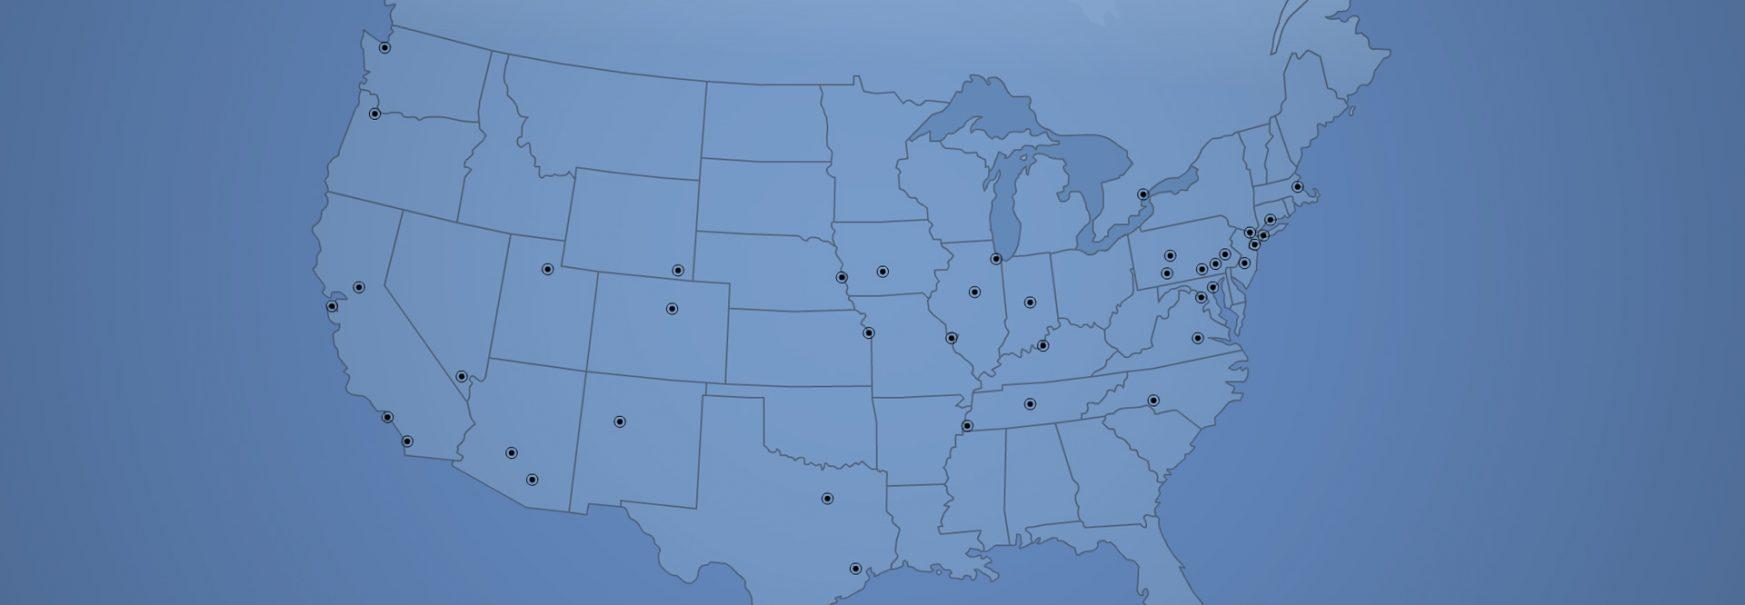 IDNNA map